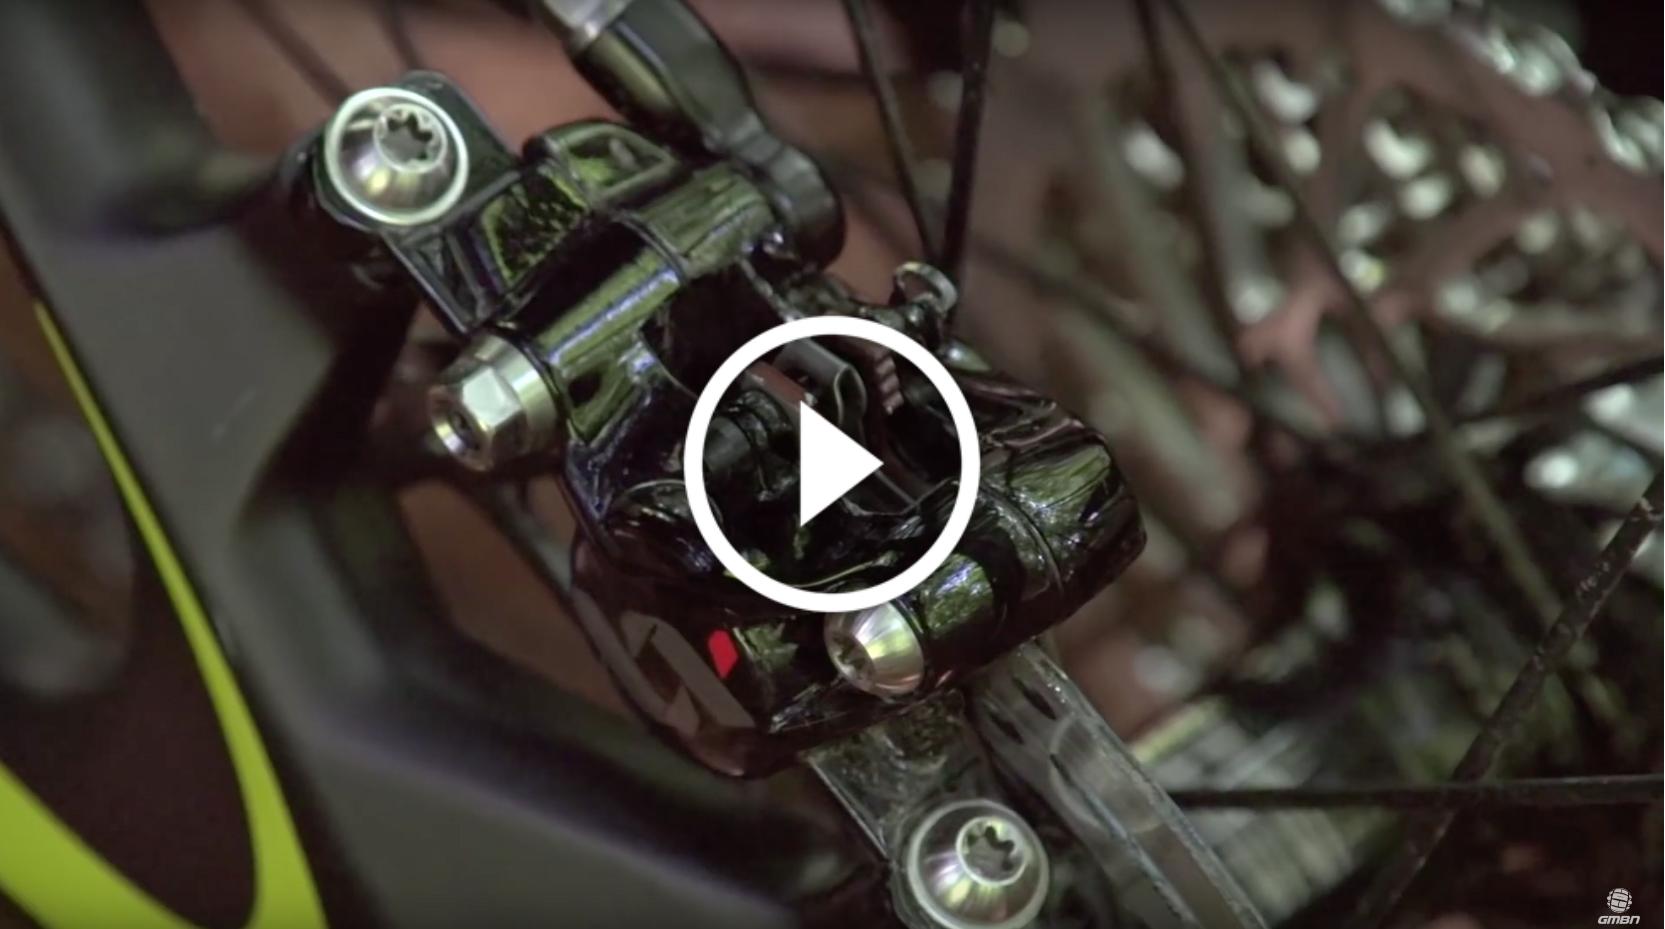 How Often To Replace Brake Pads >> Video: How To Change Mountain Bike Disc Brake Pads Trailside | Singletracks Mountain Bike News